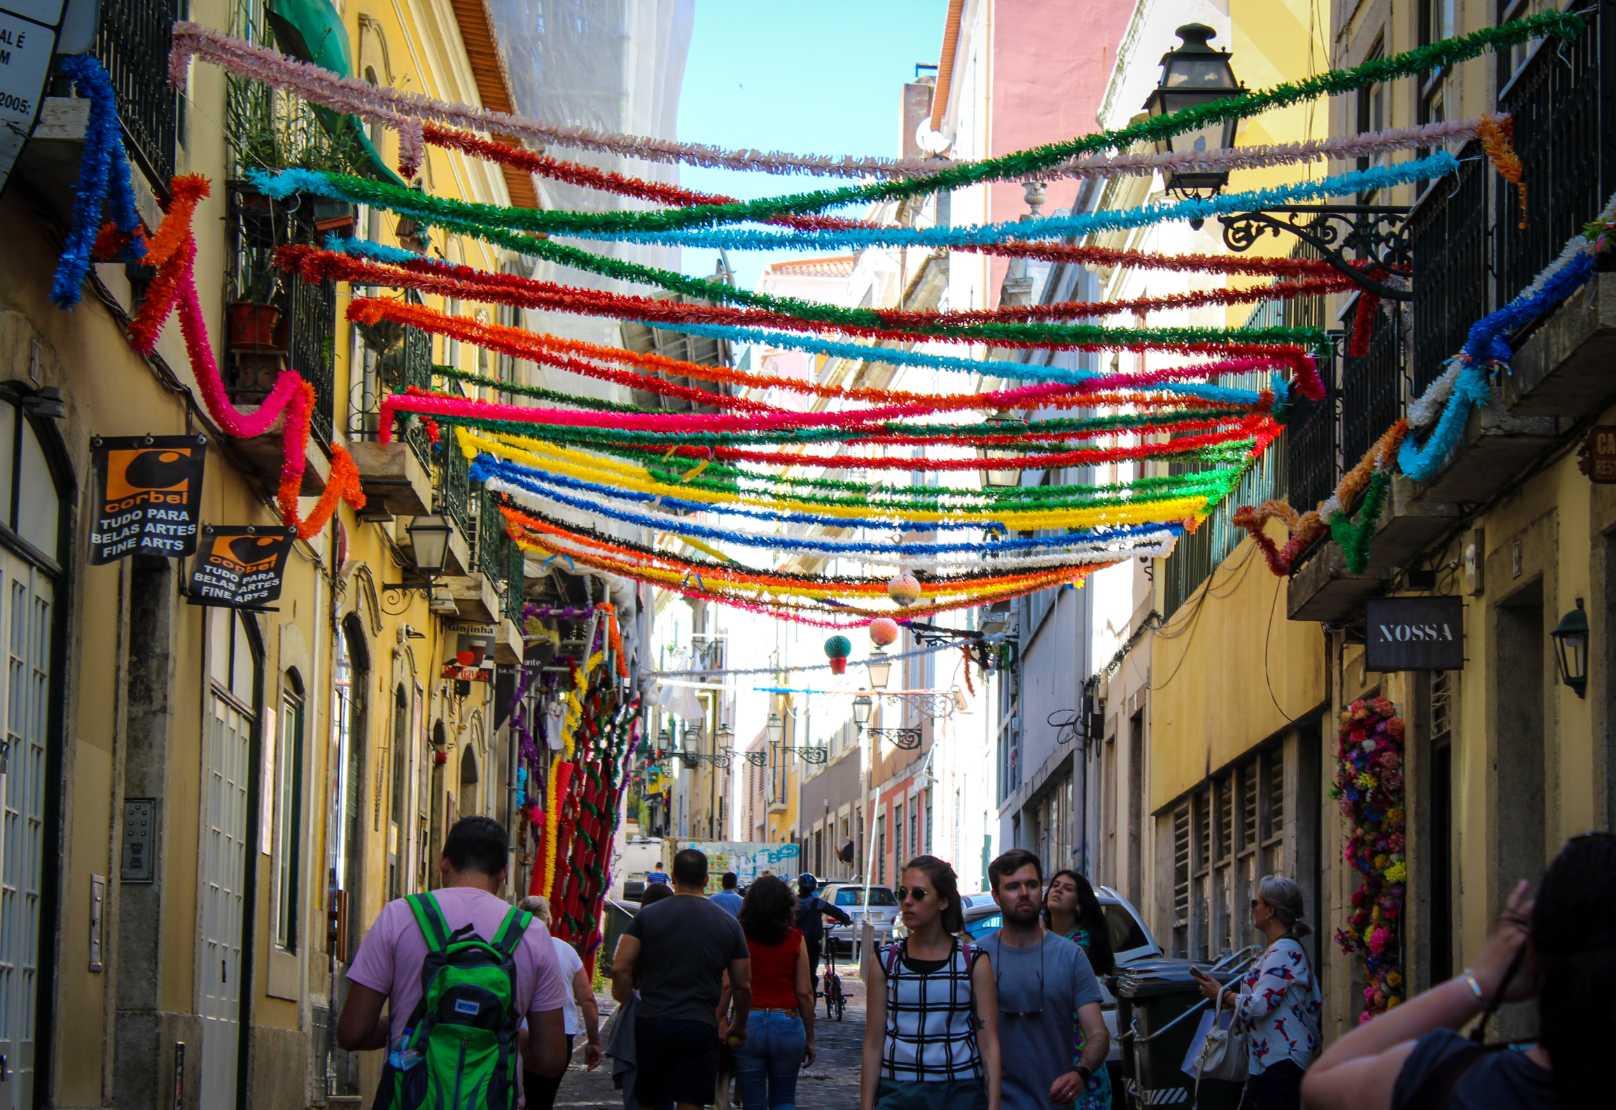 santos lisboa streets